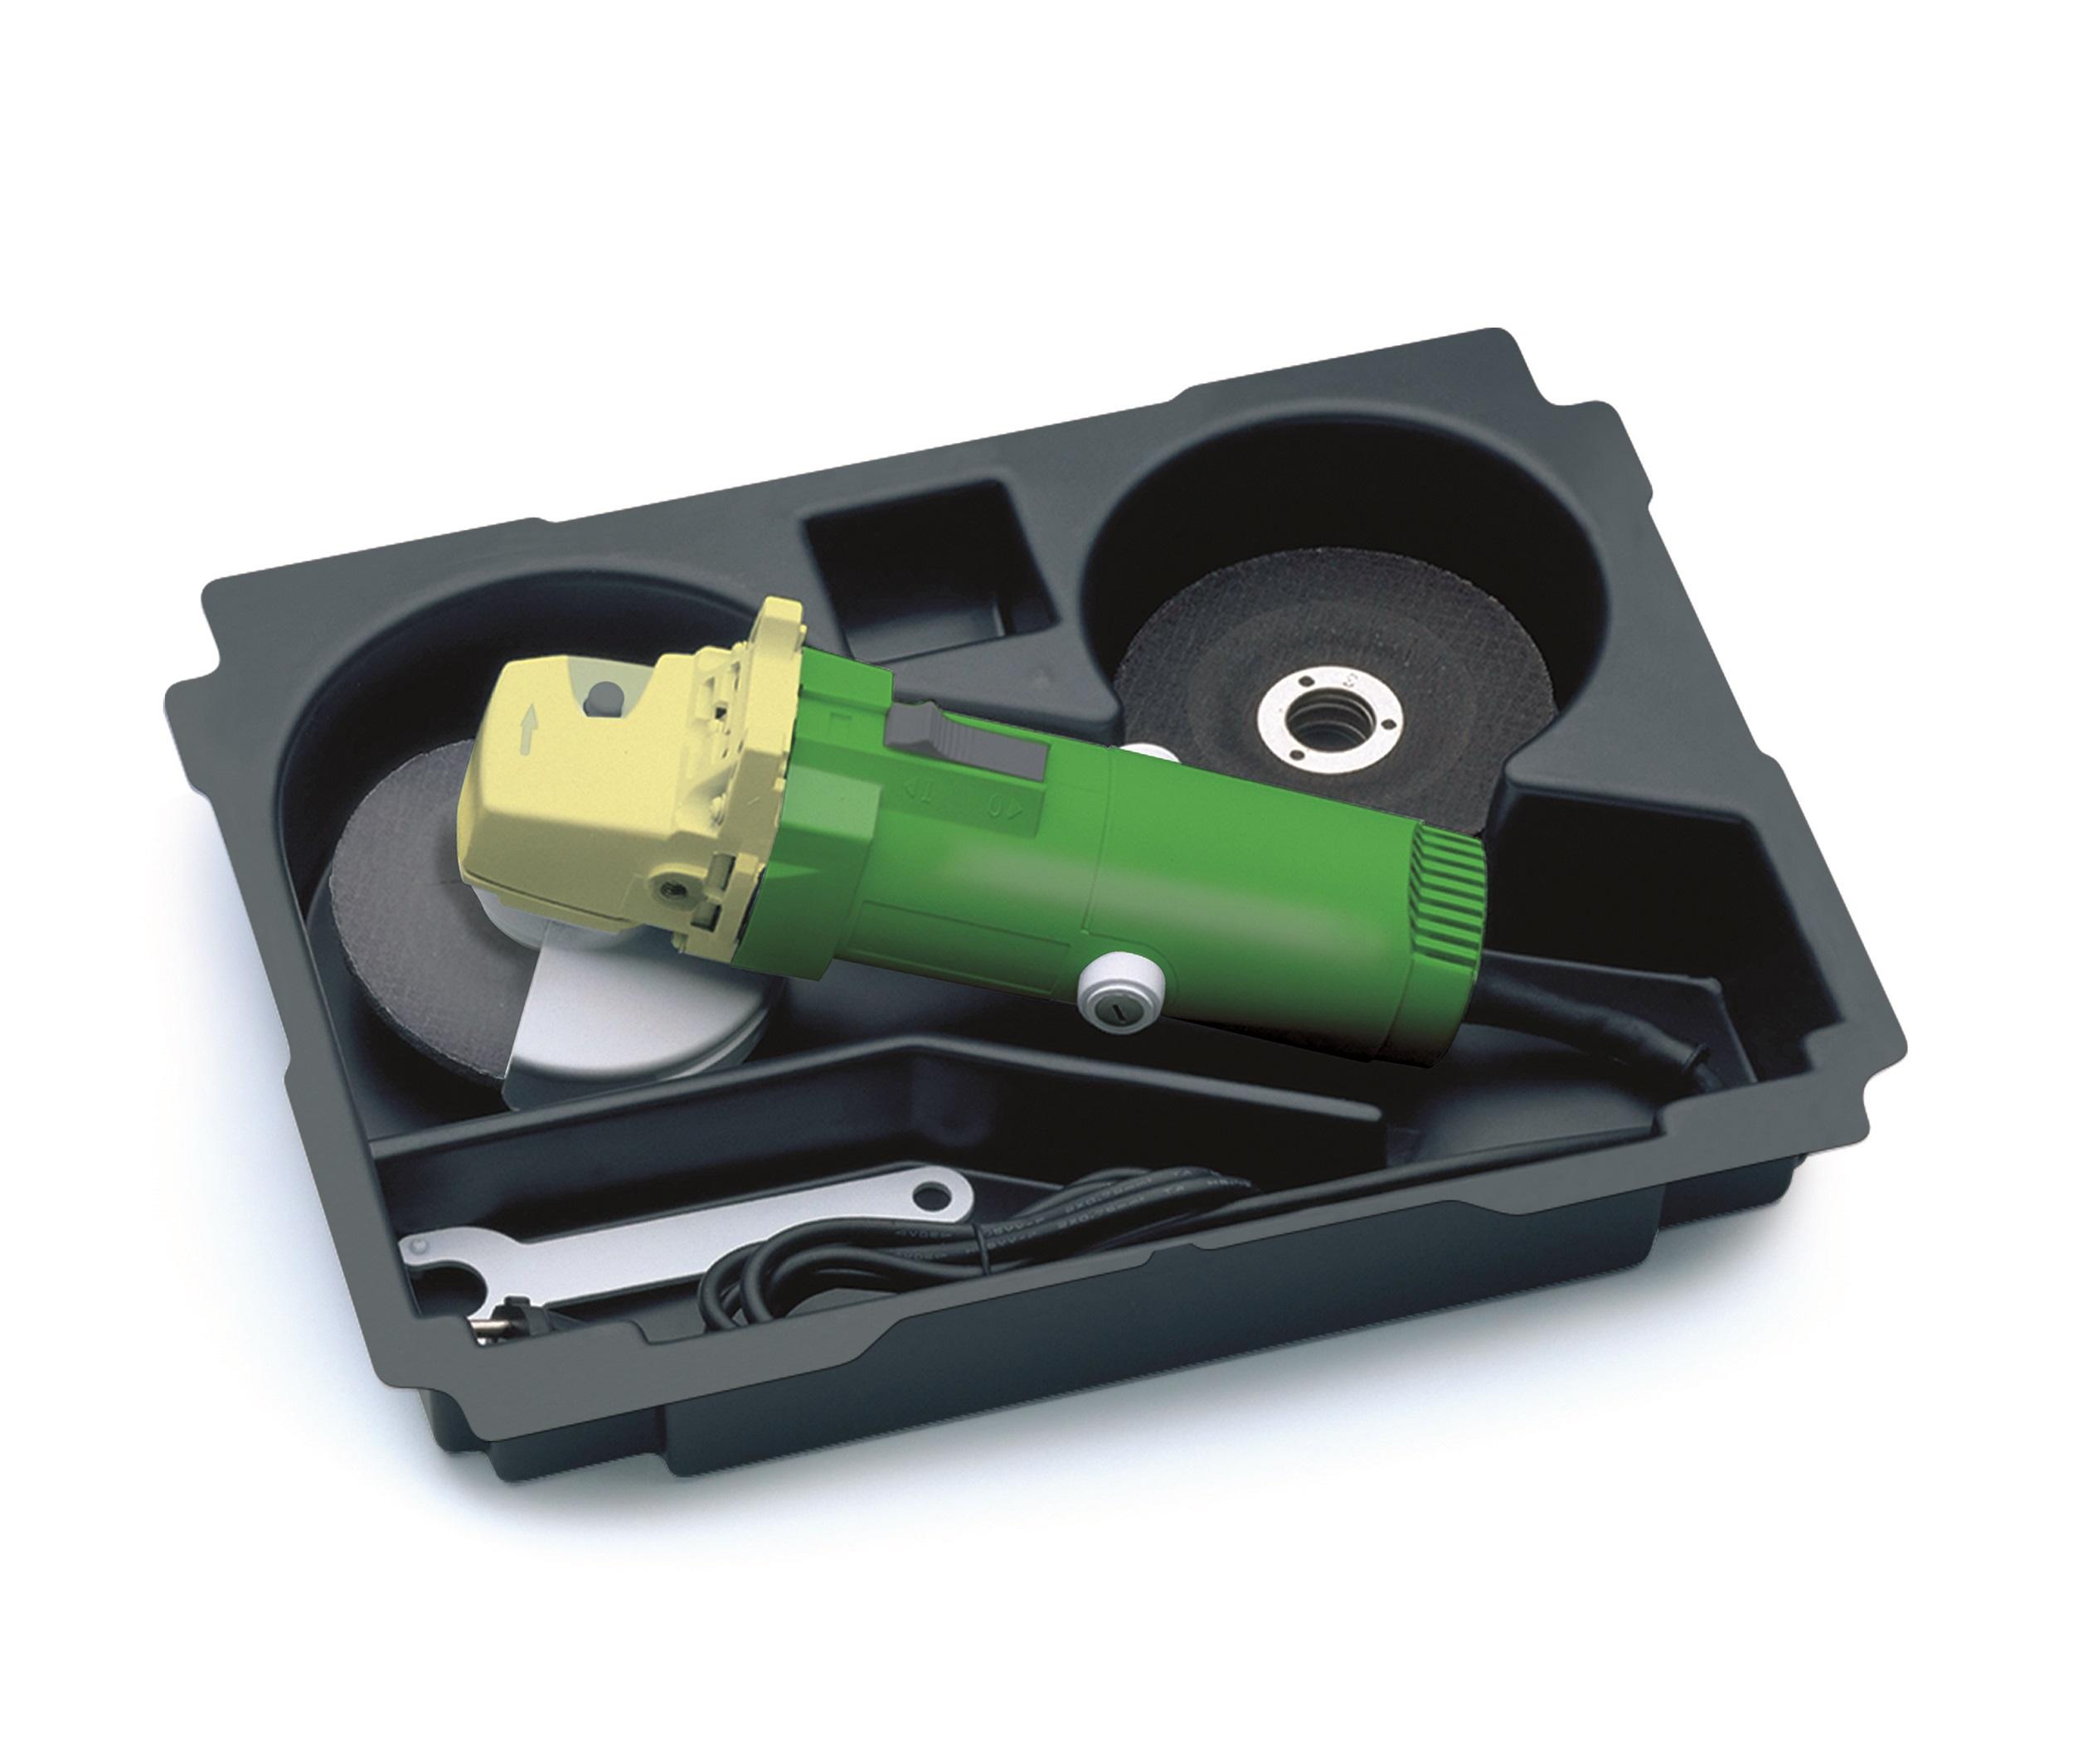 Ogquaton Premium Gear DIY Silikon Clear Stamp Climbing Seal Sammelalbum Pr/äge Album Dekoration Handwerk bequem